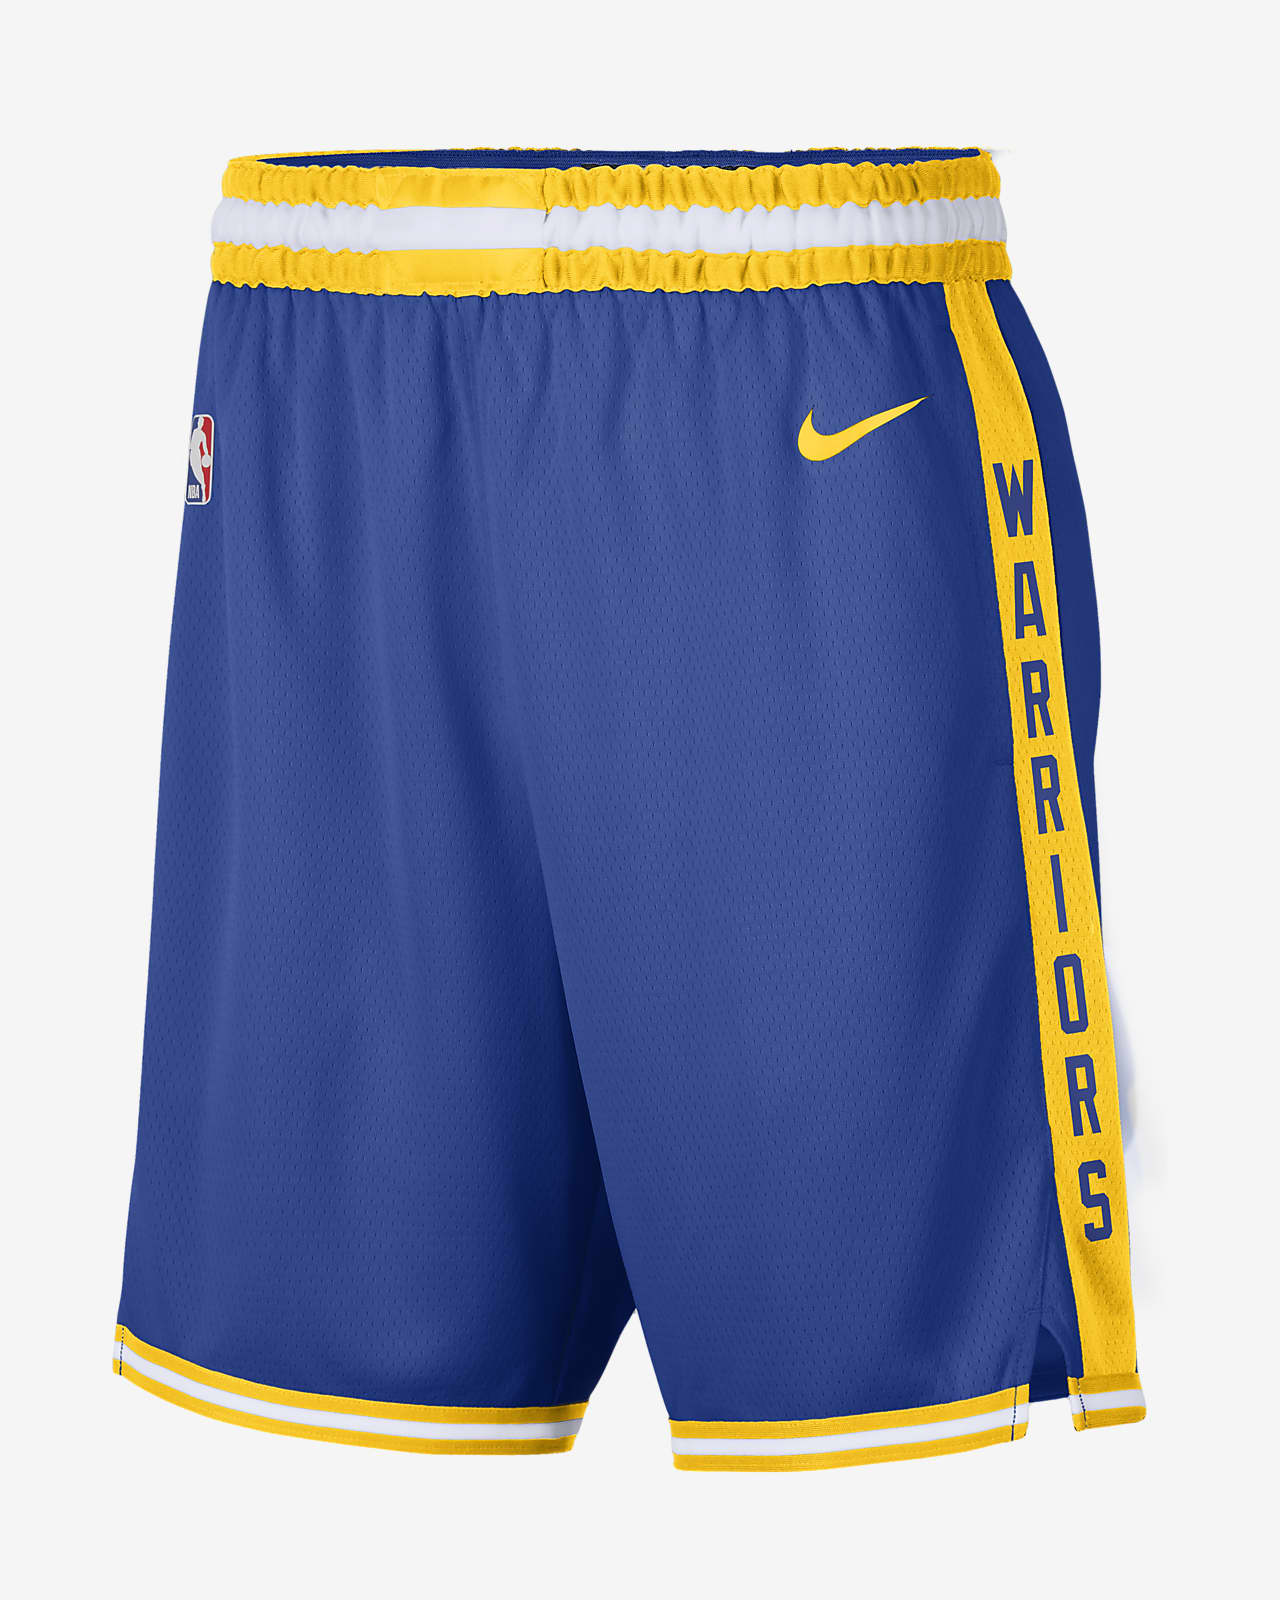 2020 赛季金州勇士队 Classic Edition Nike NBA Swingman 男子短裤